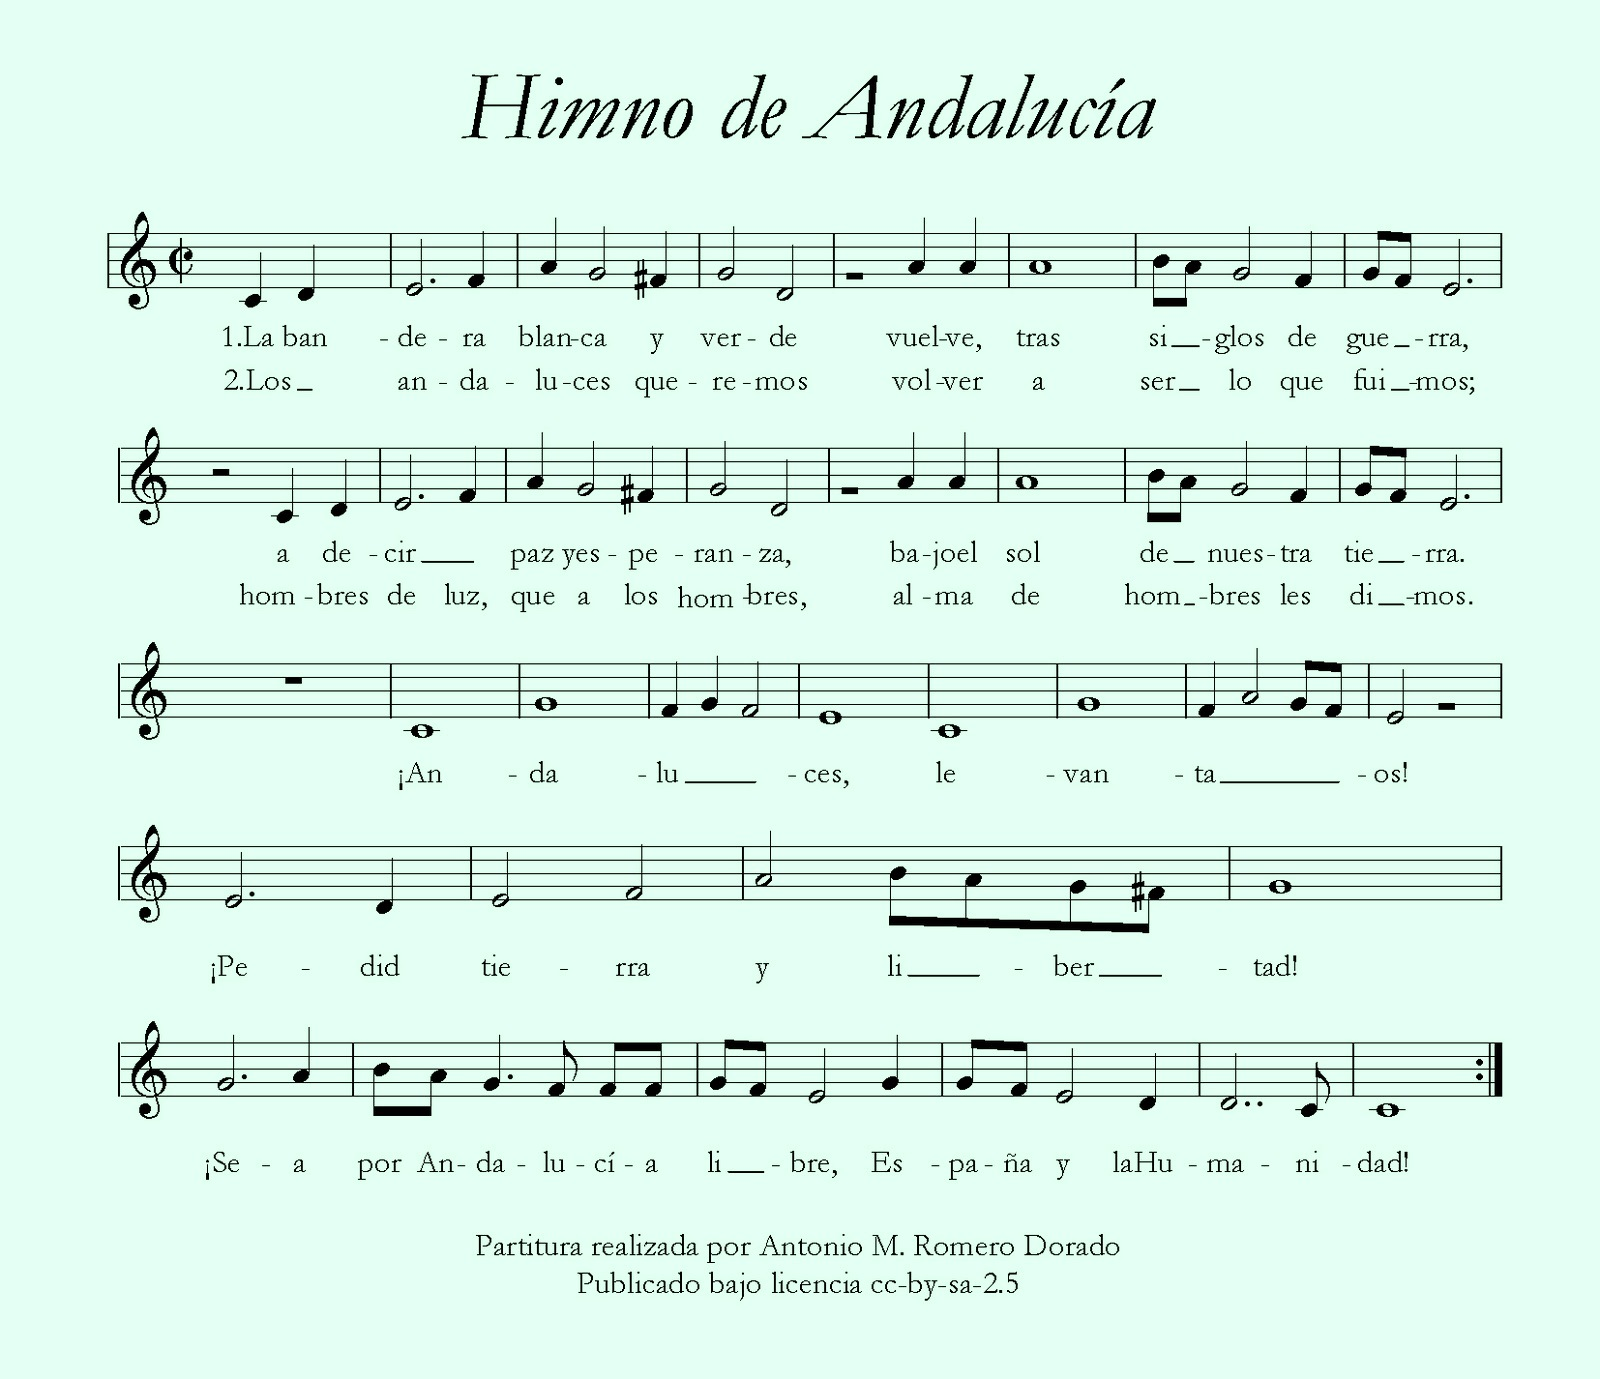 himno de el sevilla: